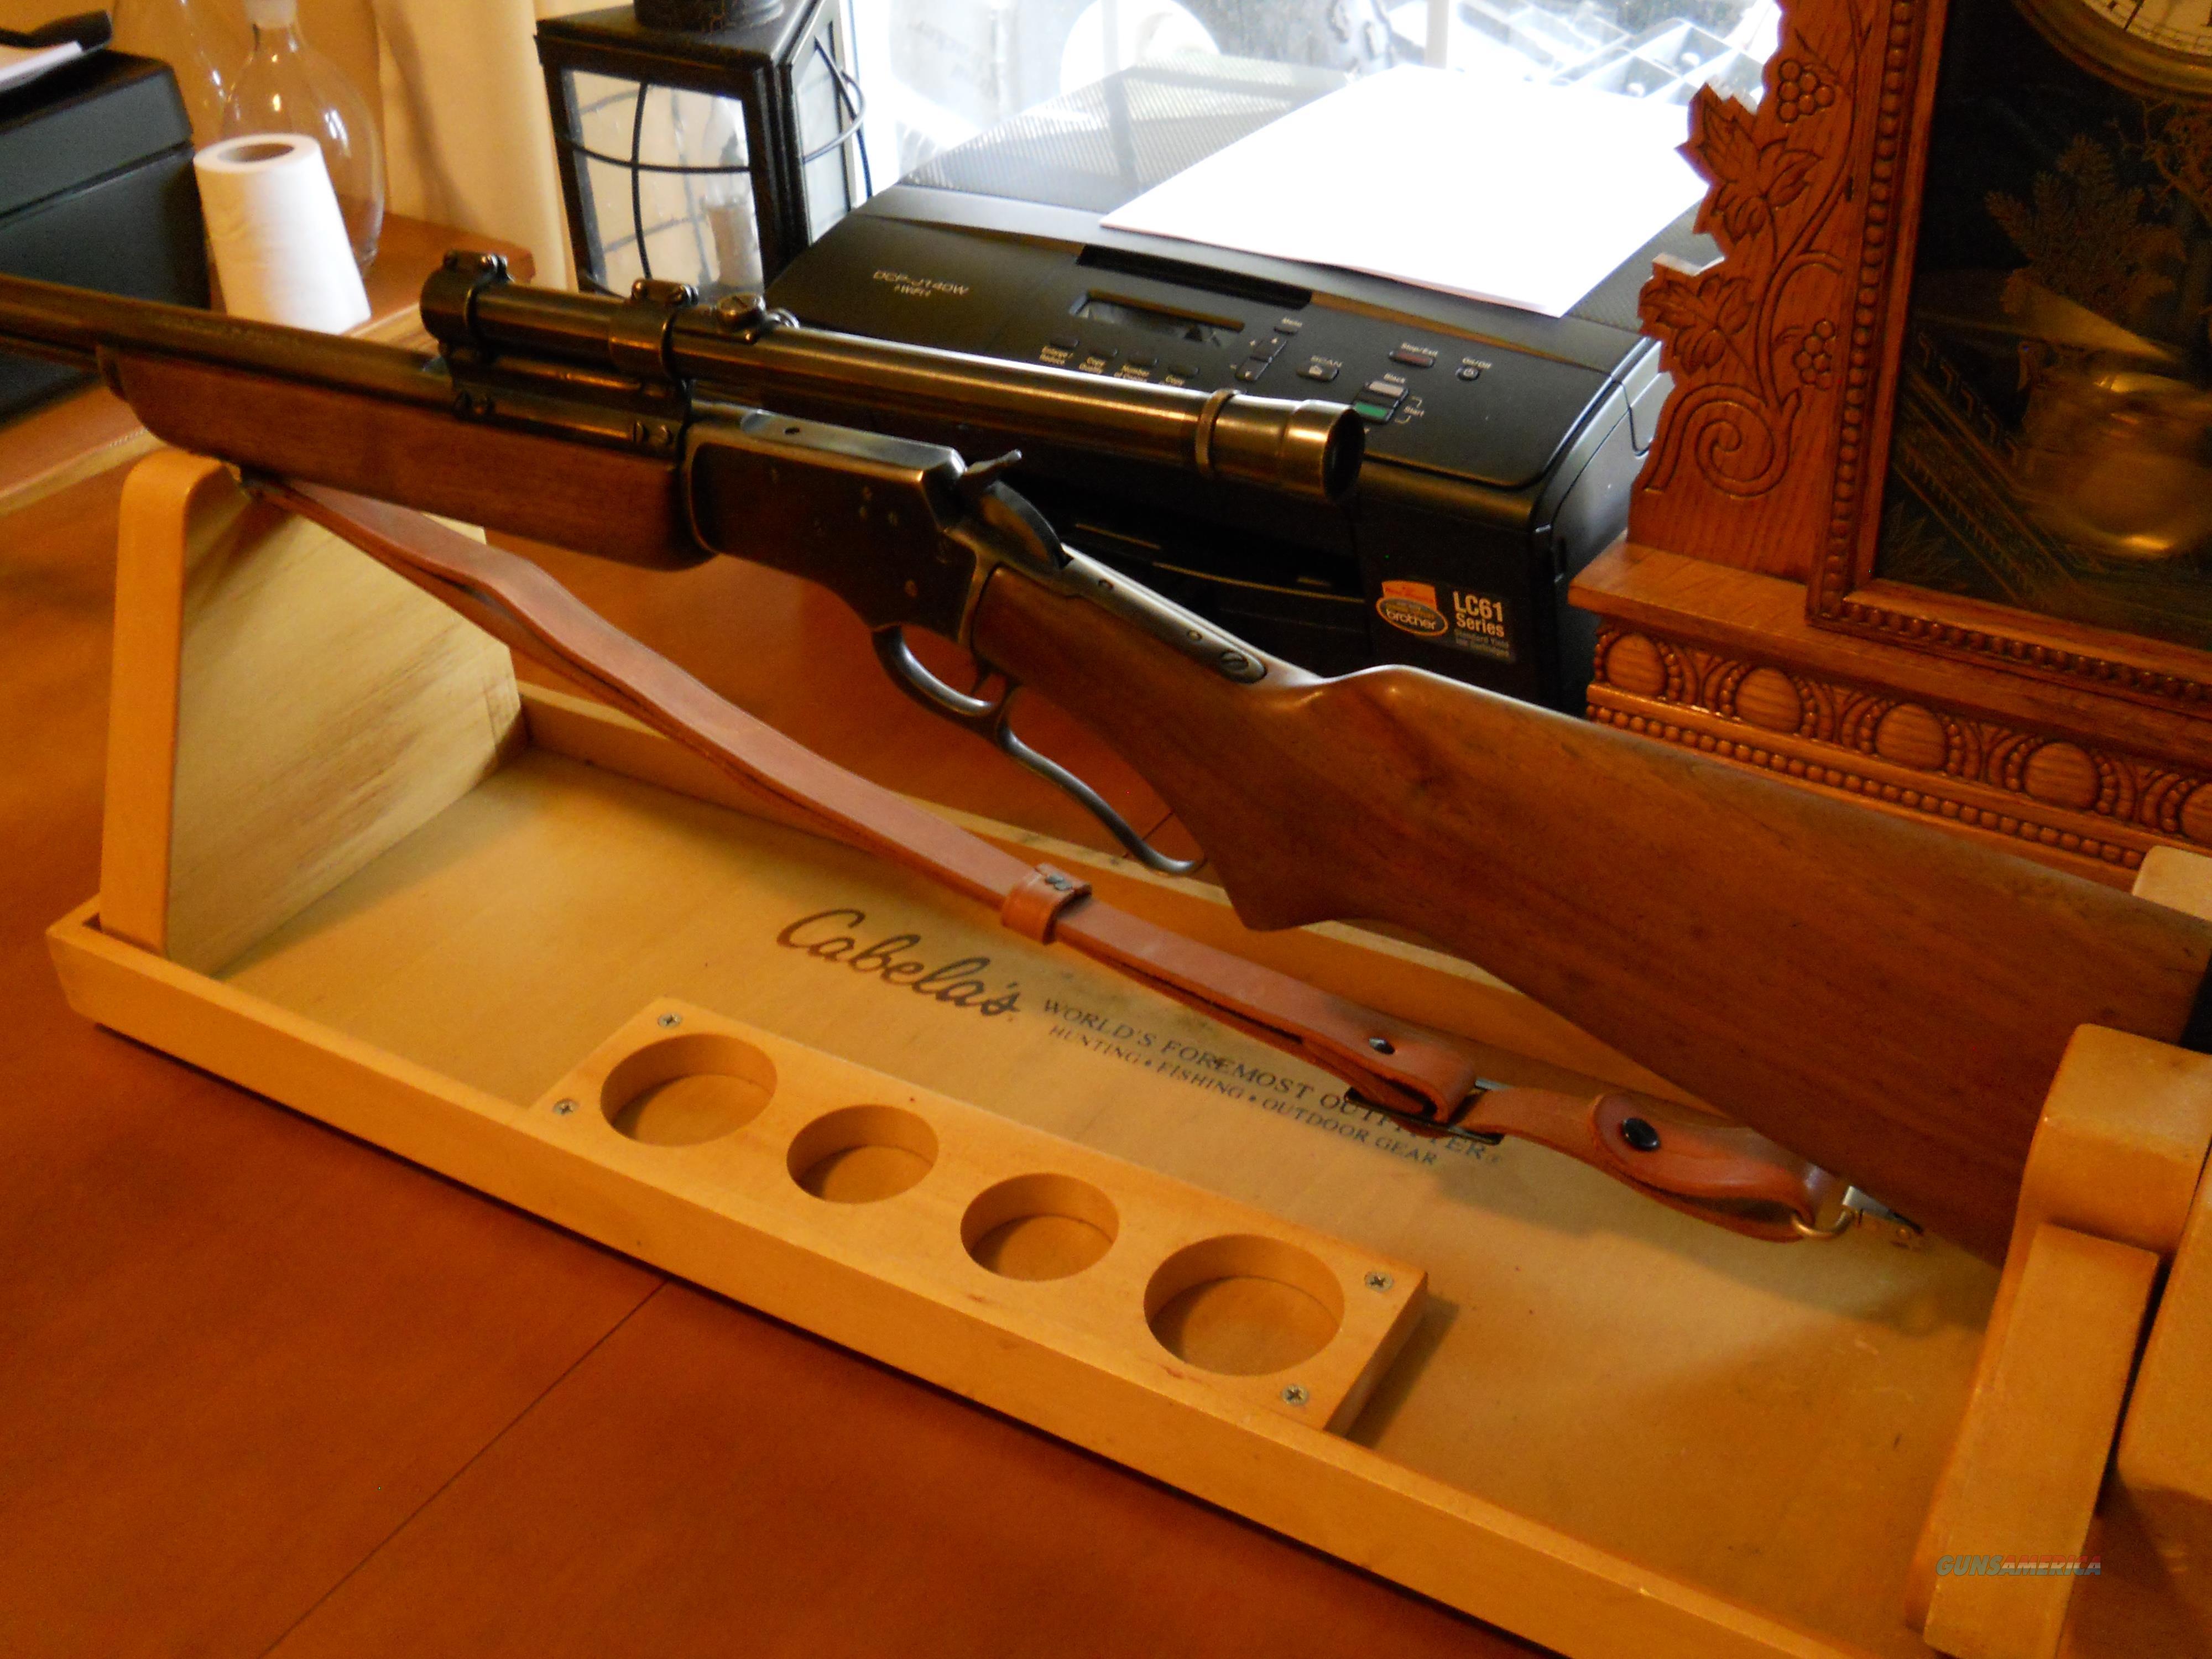 Marlin 39A Golden .22 lever action with marlin sling & Weaver scope  Guns > Rifles > Marlin Rifles > Modern > Lever Action